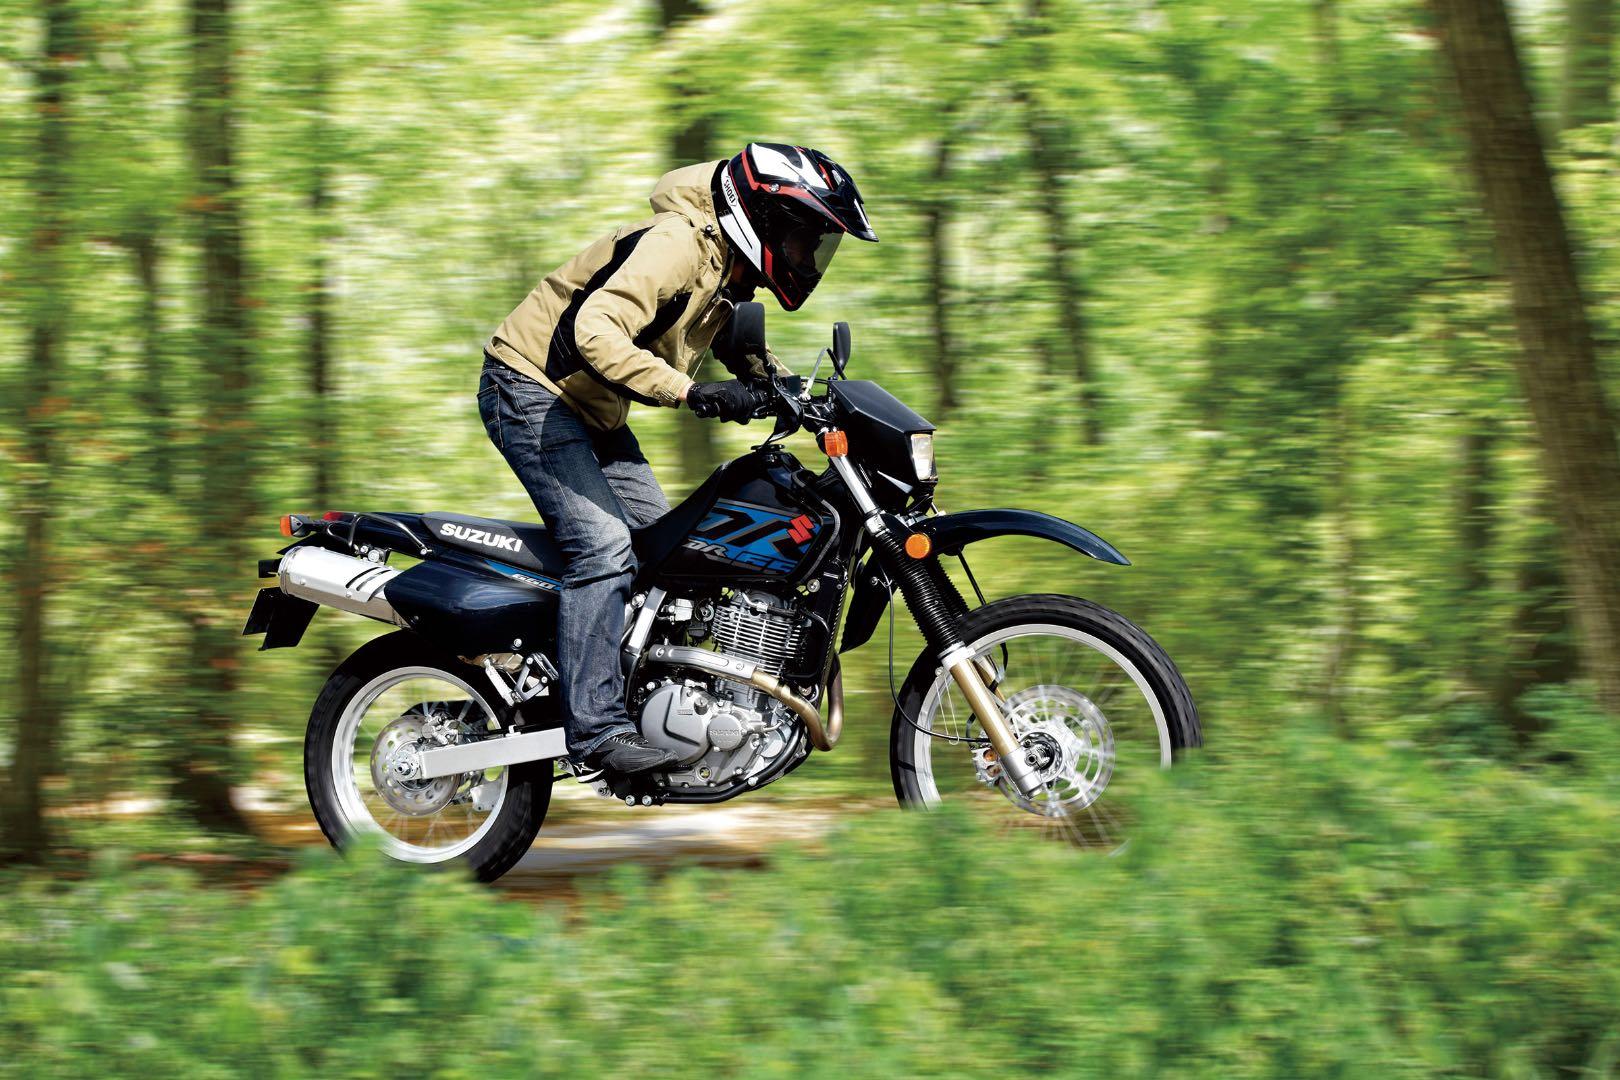 2017 Suzuki DR650S Buyer's Guide | Price & Specs